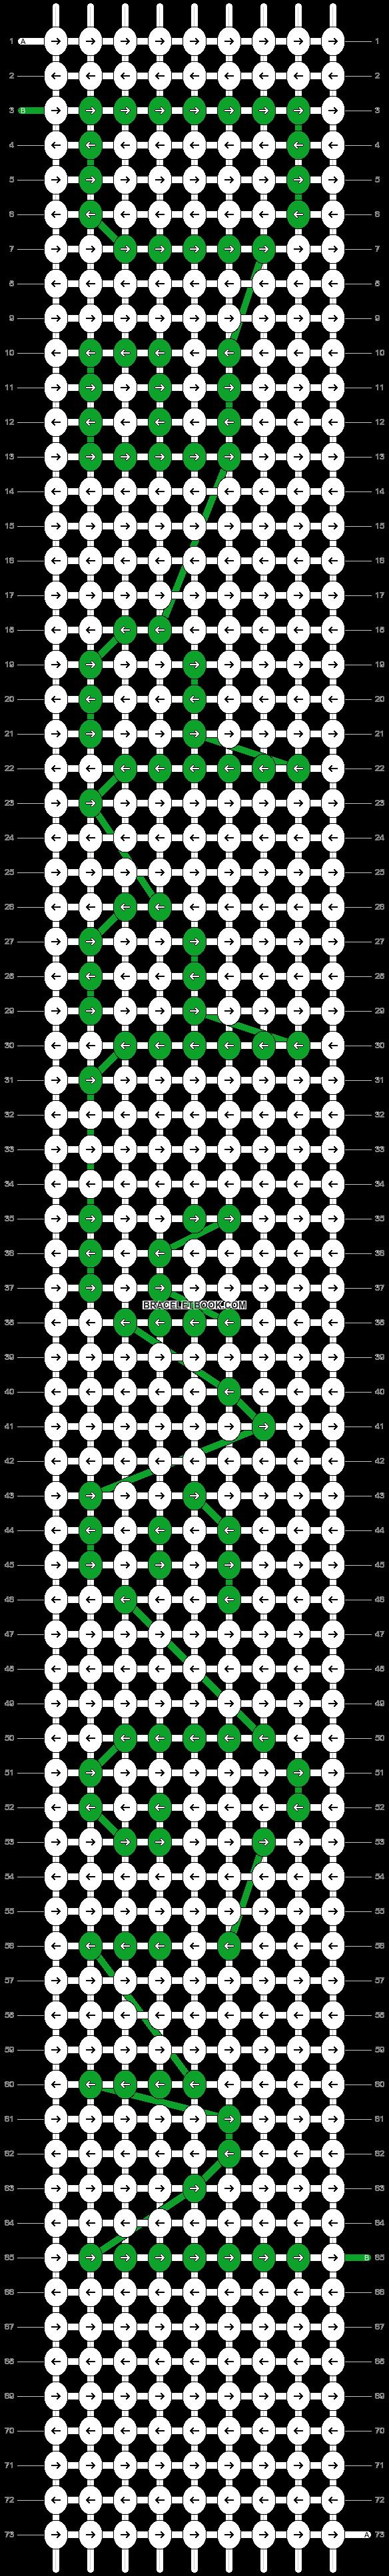 Alpha pattern #5905 pattern